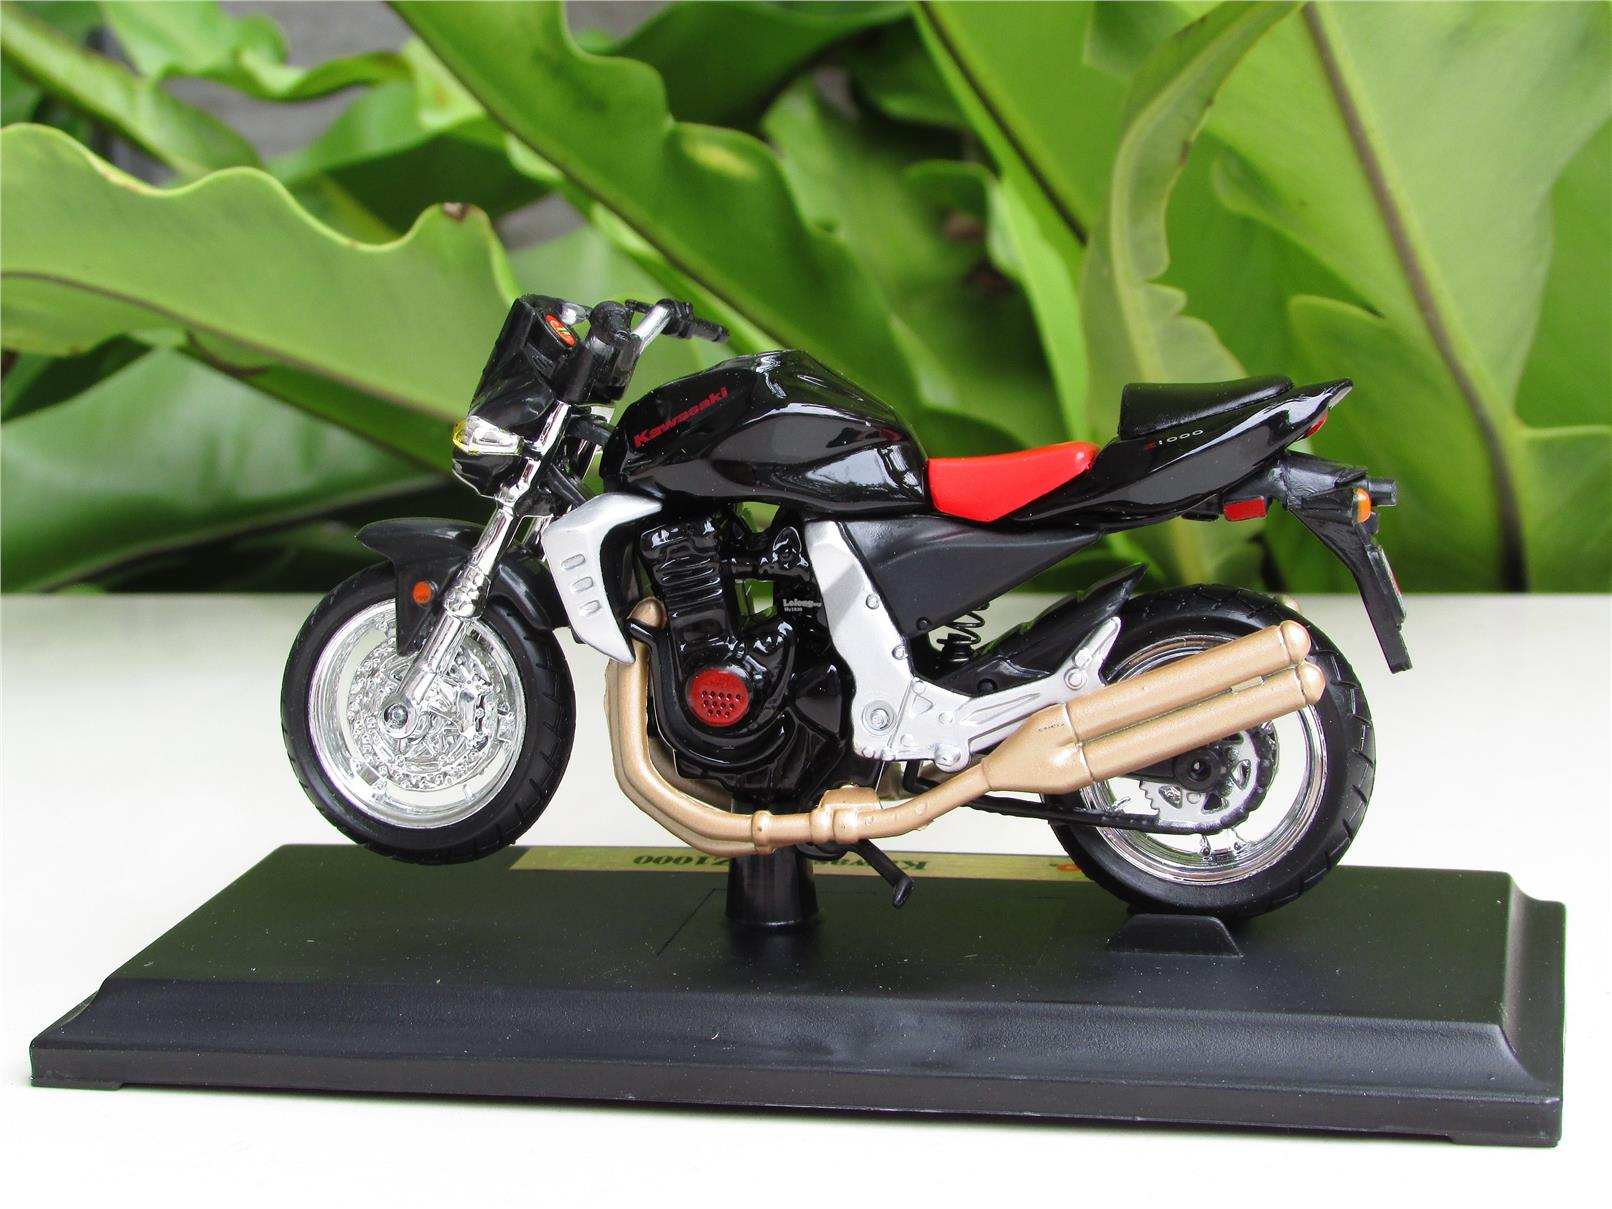 Maisto 1 18 Diecast Motorcycle Kawasaki Z1000 Black